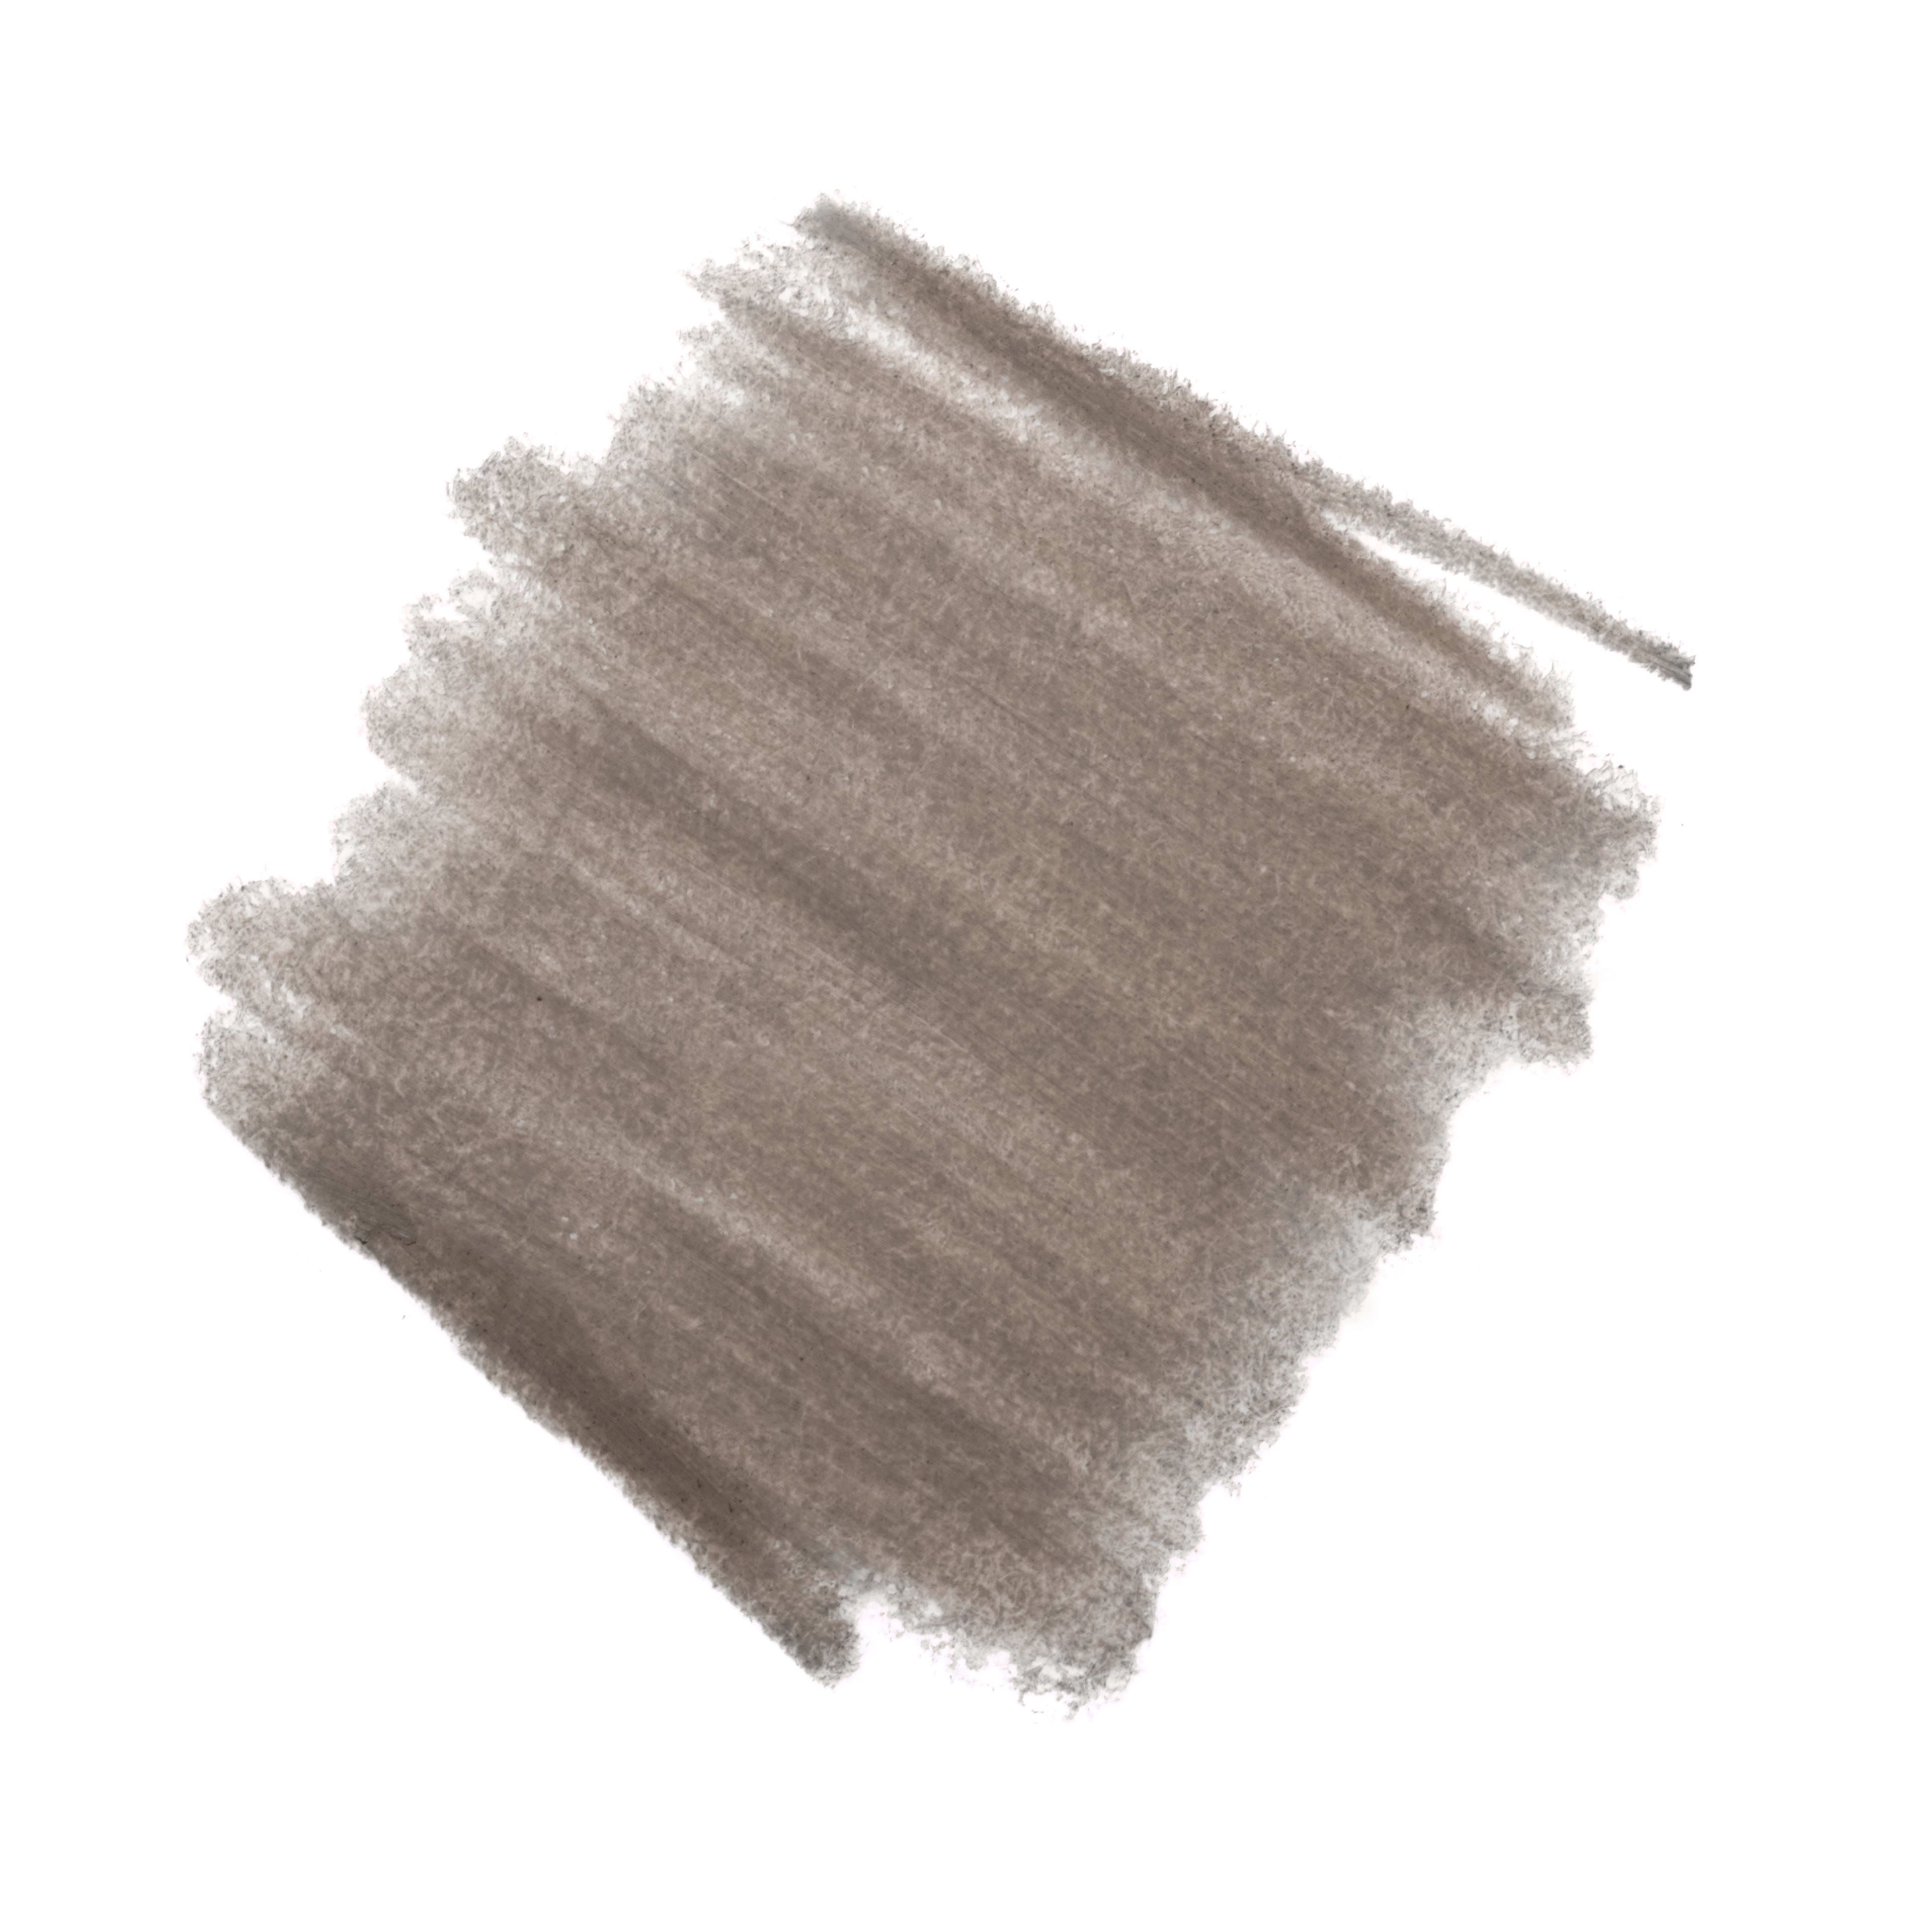 CRAYON SOURCILS - makeup - 0.03OZ. - Basic texture view